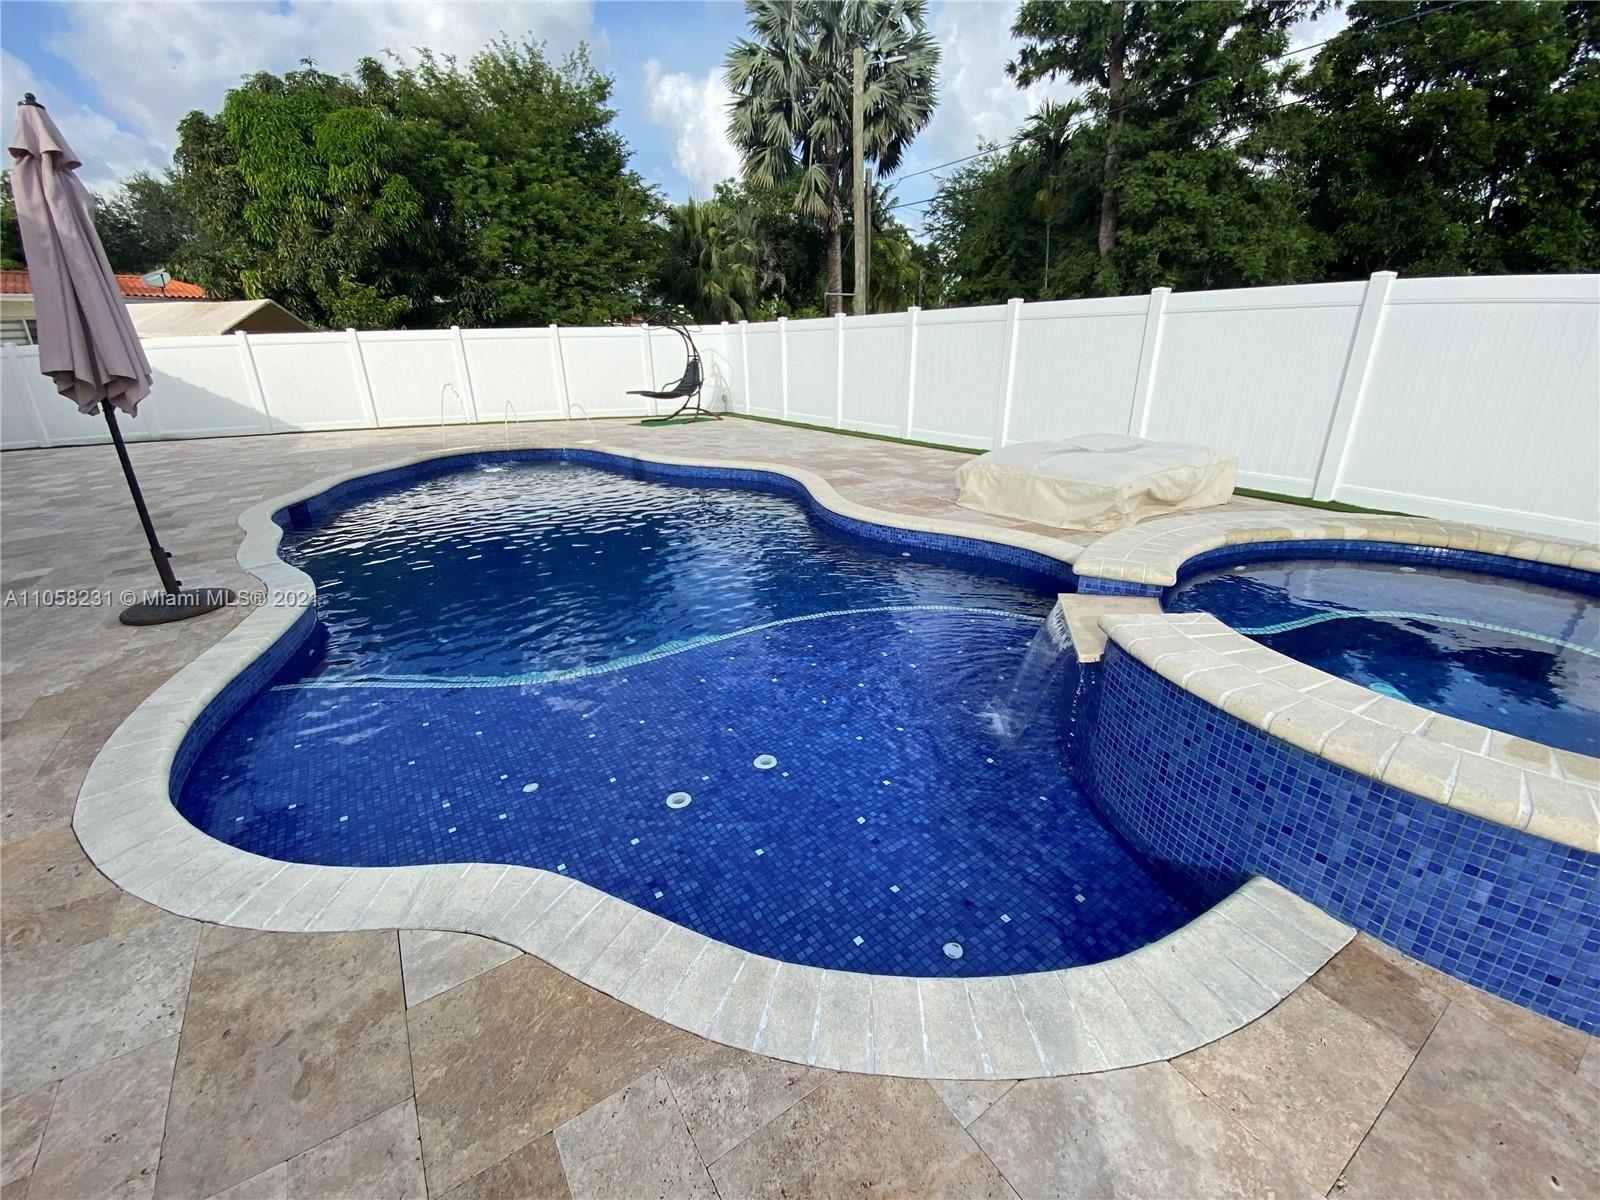 30 Bentley Dr, Miami Springs, FL 33166 - #: A11058231